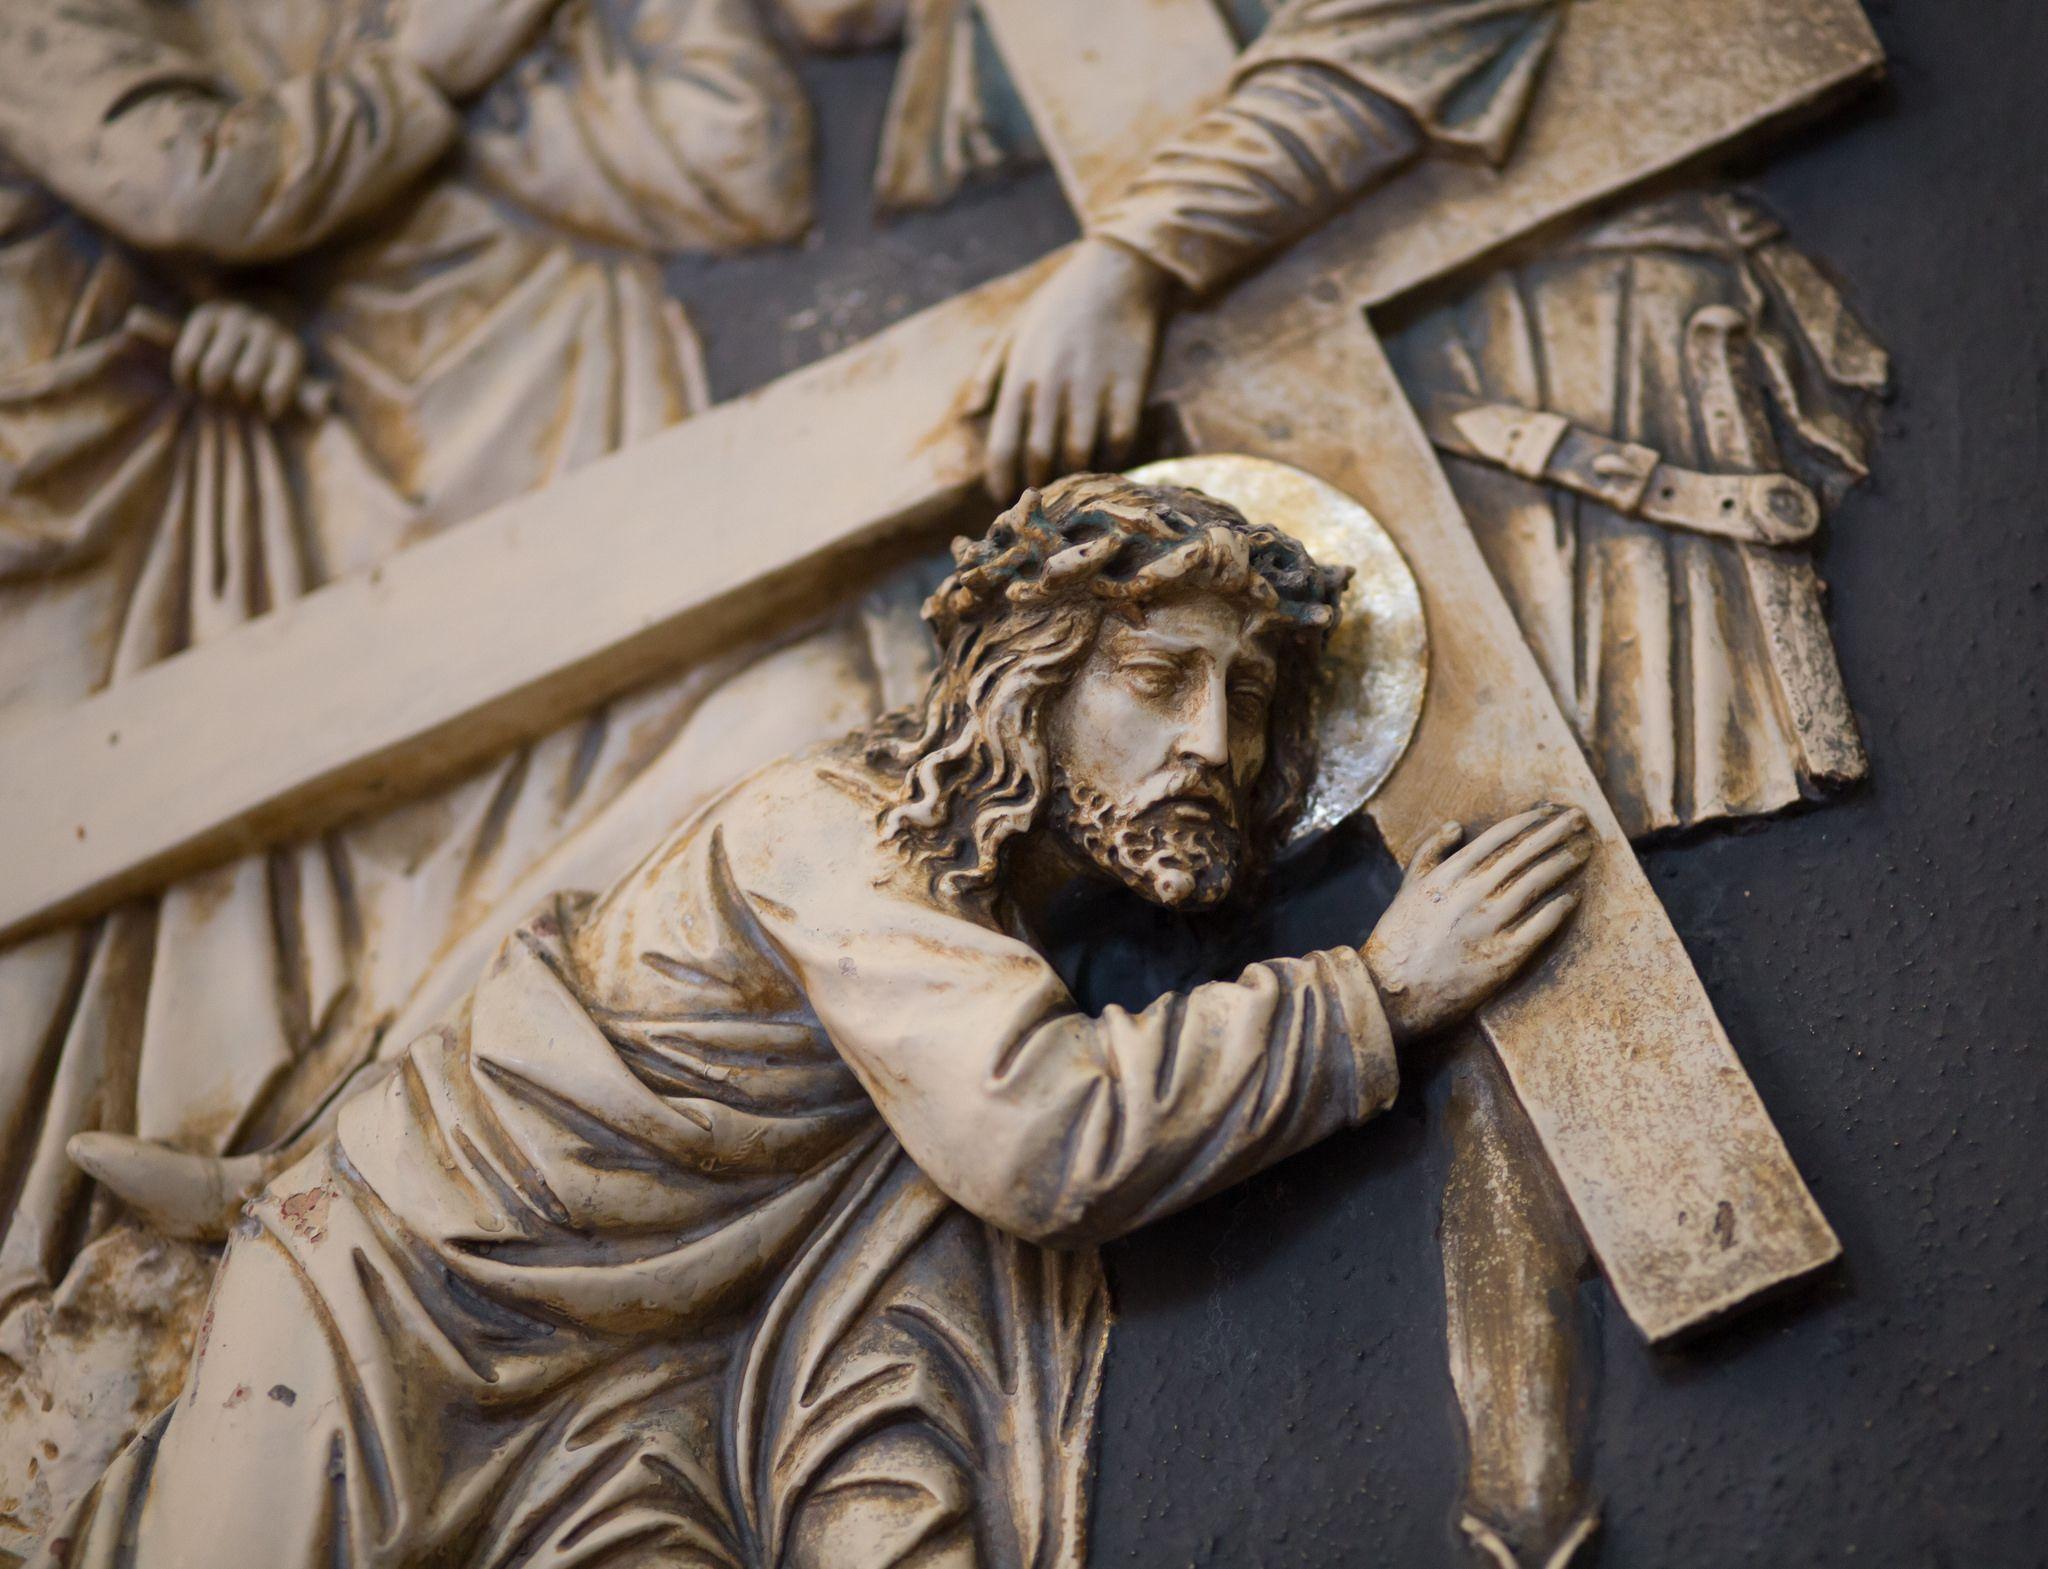 Jesus Fallt Zum Zweiten Mal Unter Dem Kreuz Religiose Kunst Kreuze Kunst